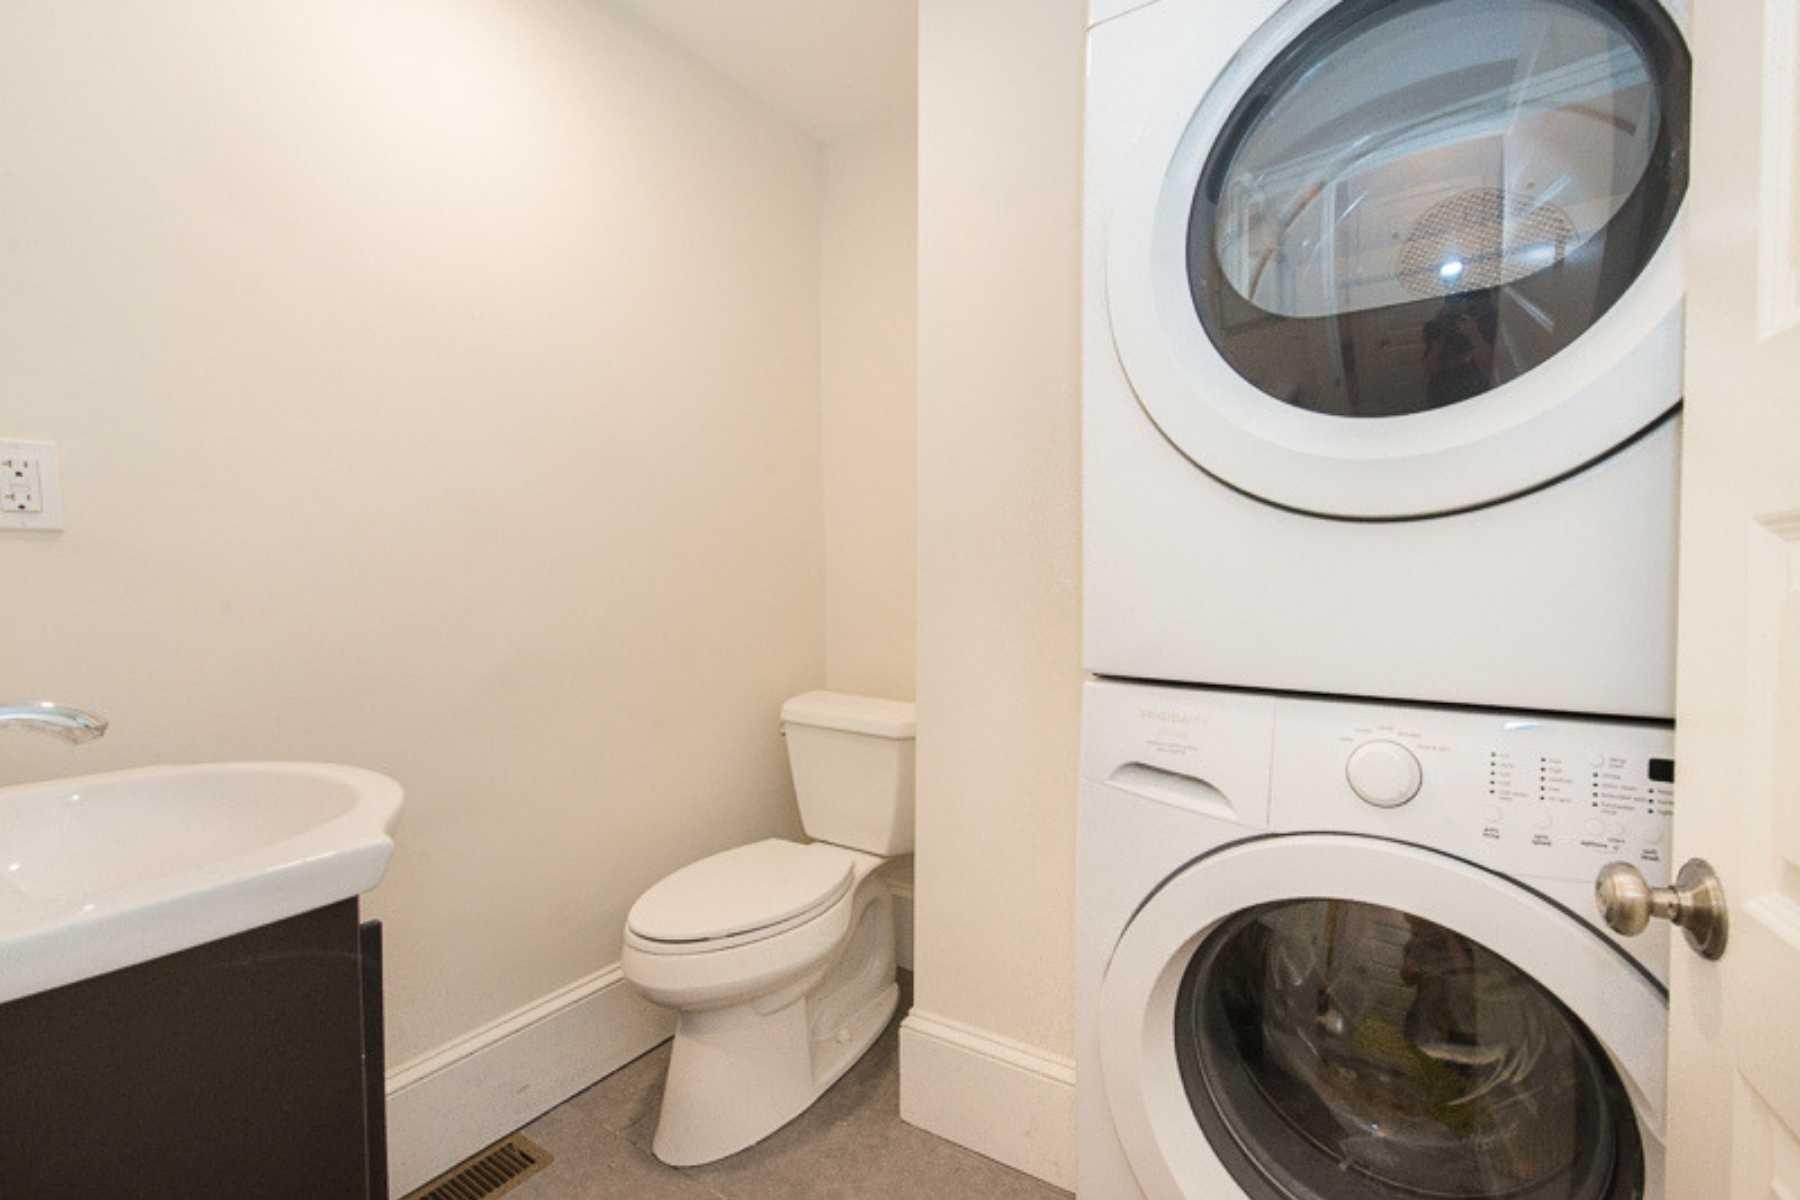 9-CapstoneCommunities-property-Riverside-Place-Apartments-Cambridge.jpg